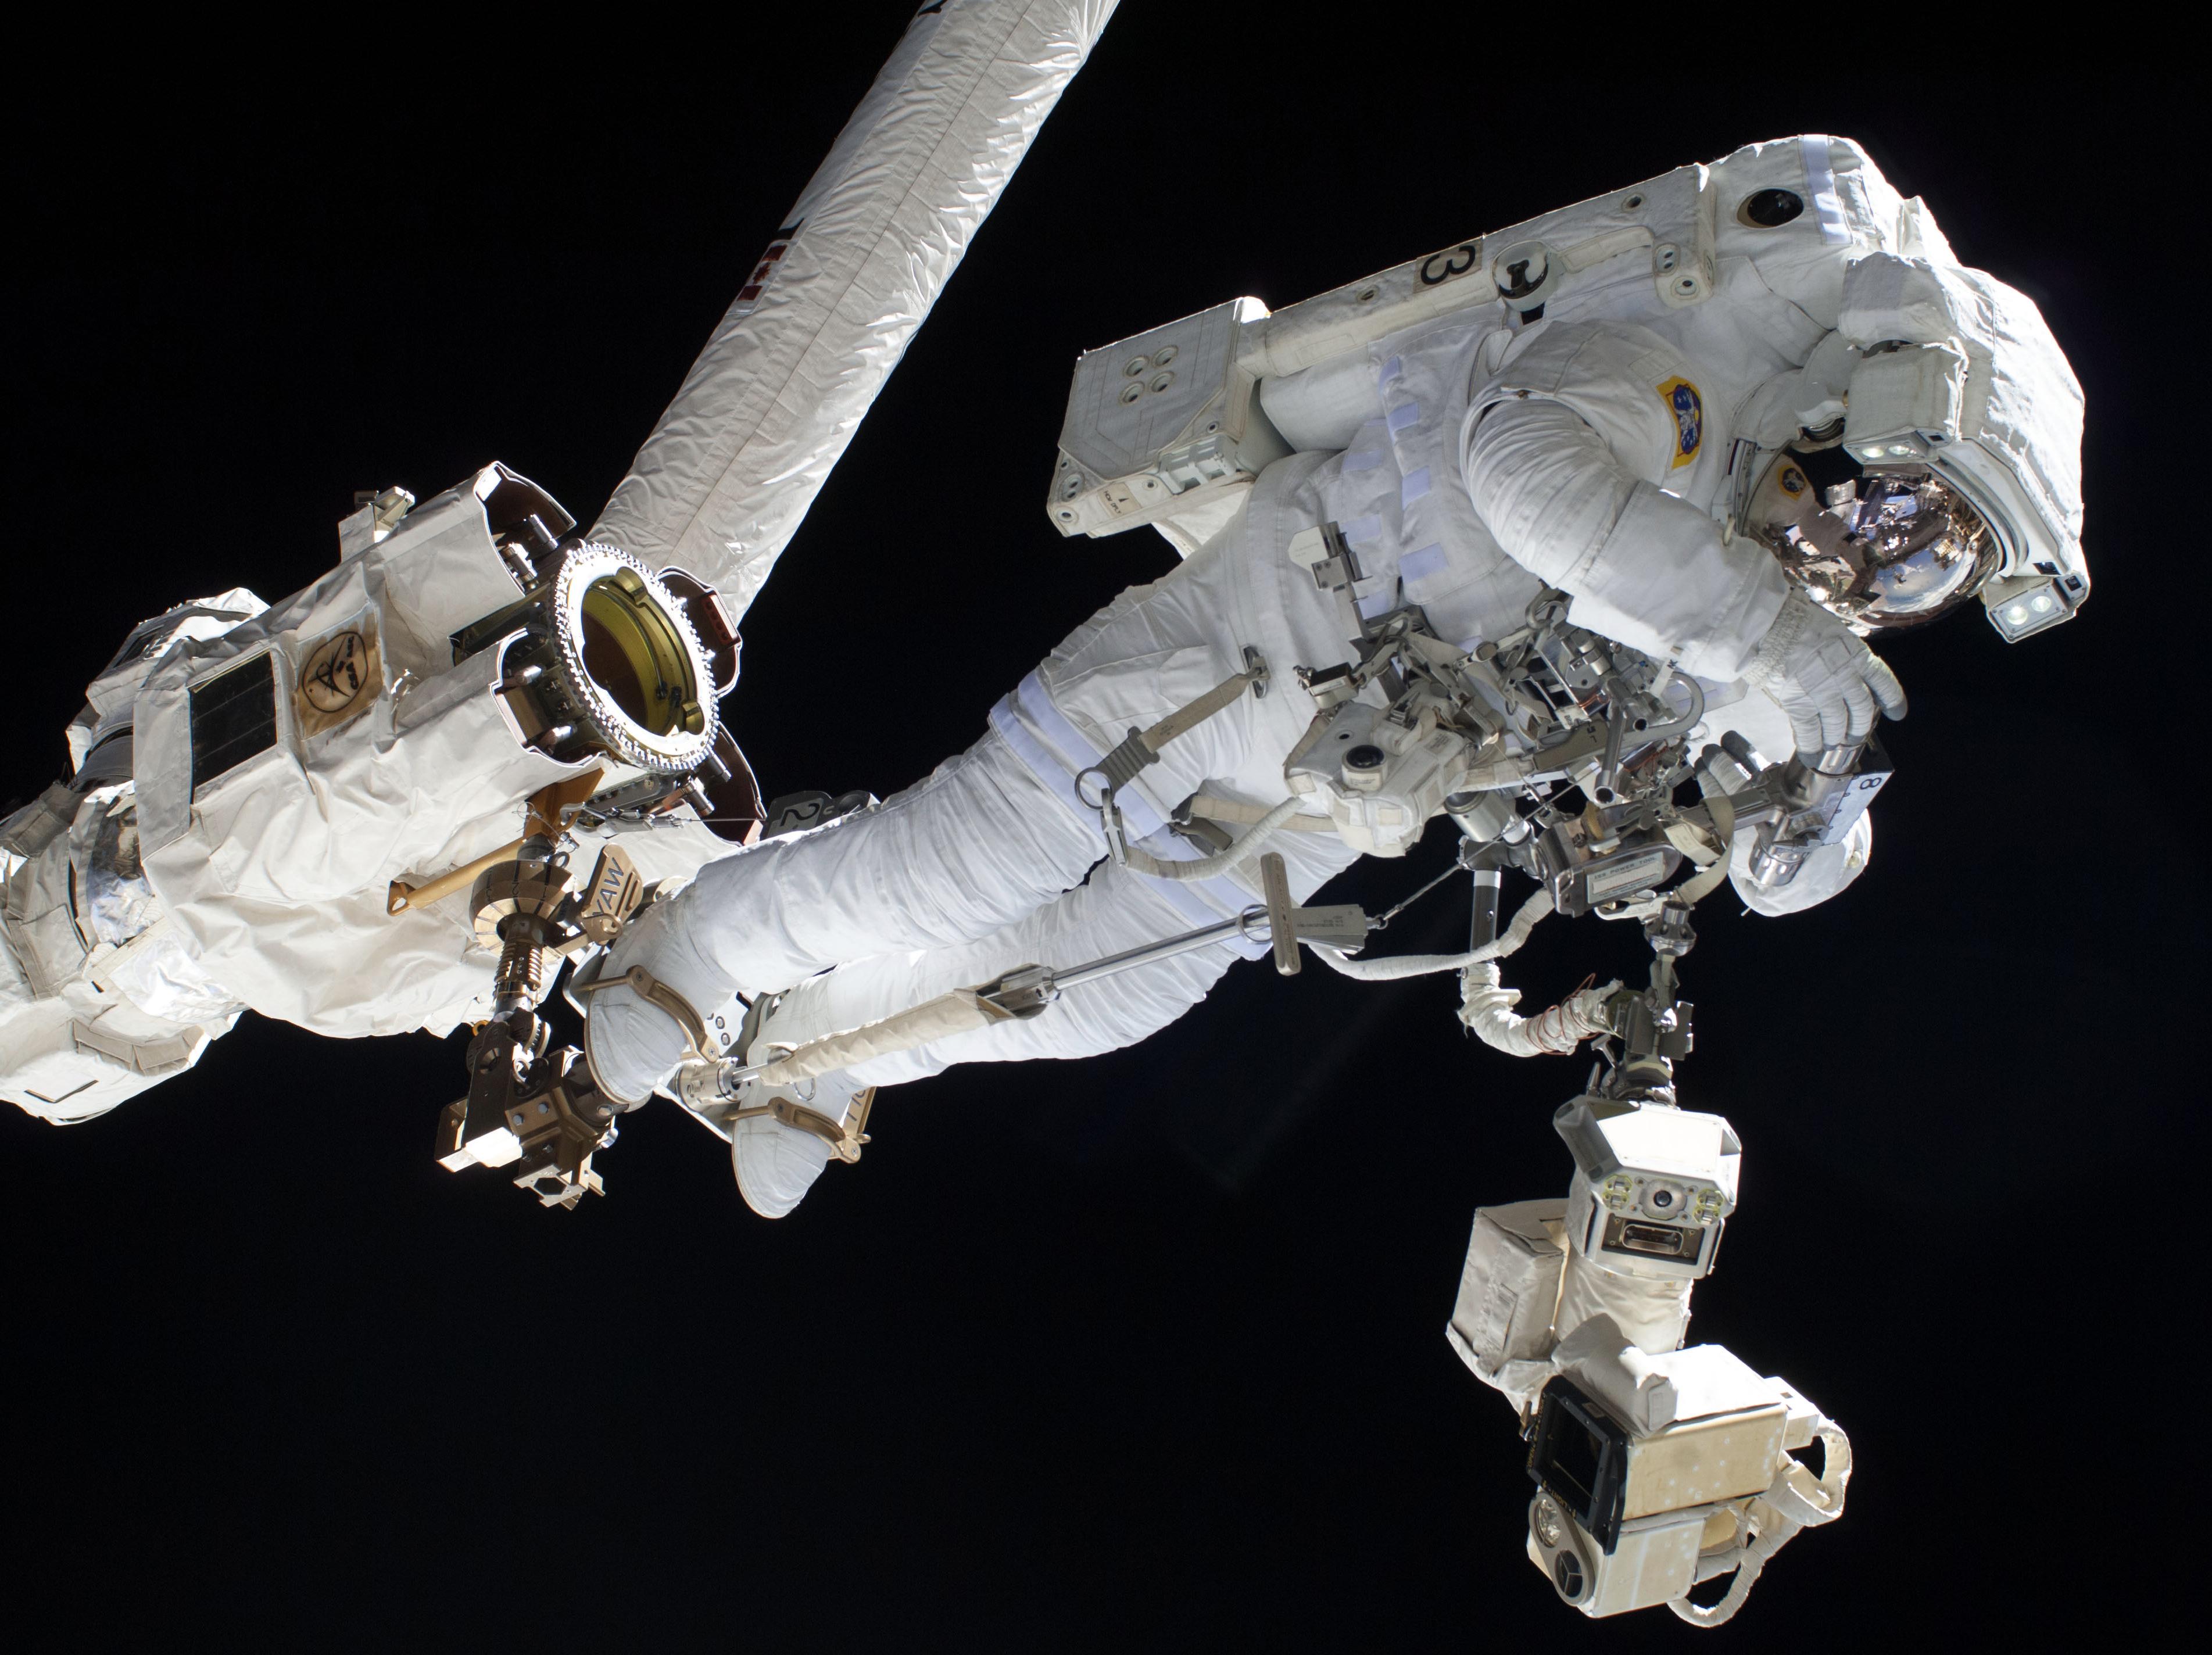 astronauts spacecraft for short crossword - photo #34